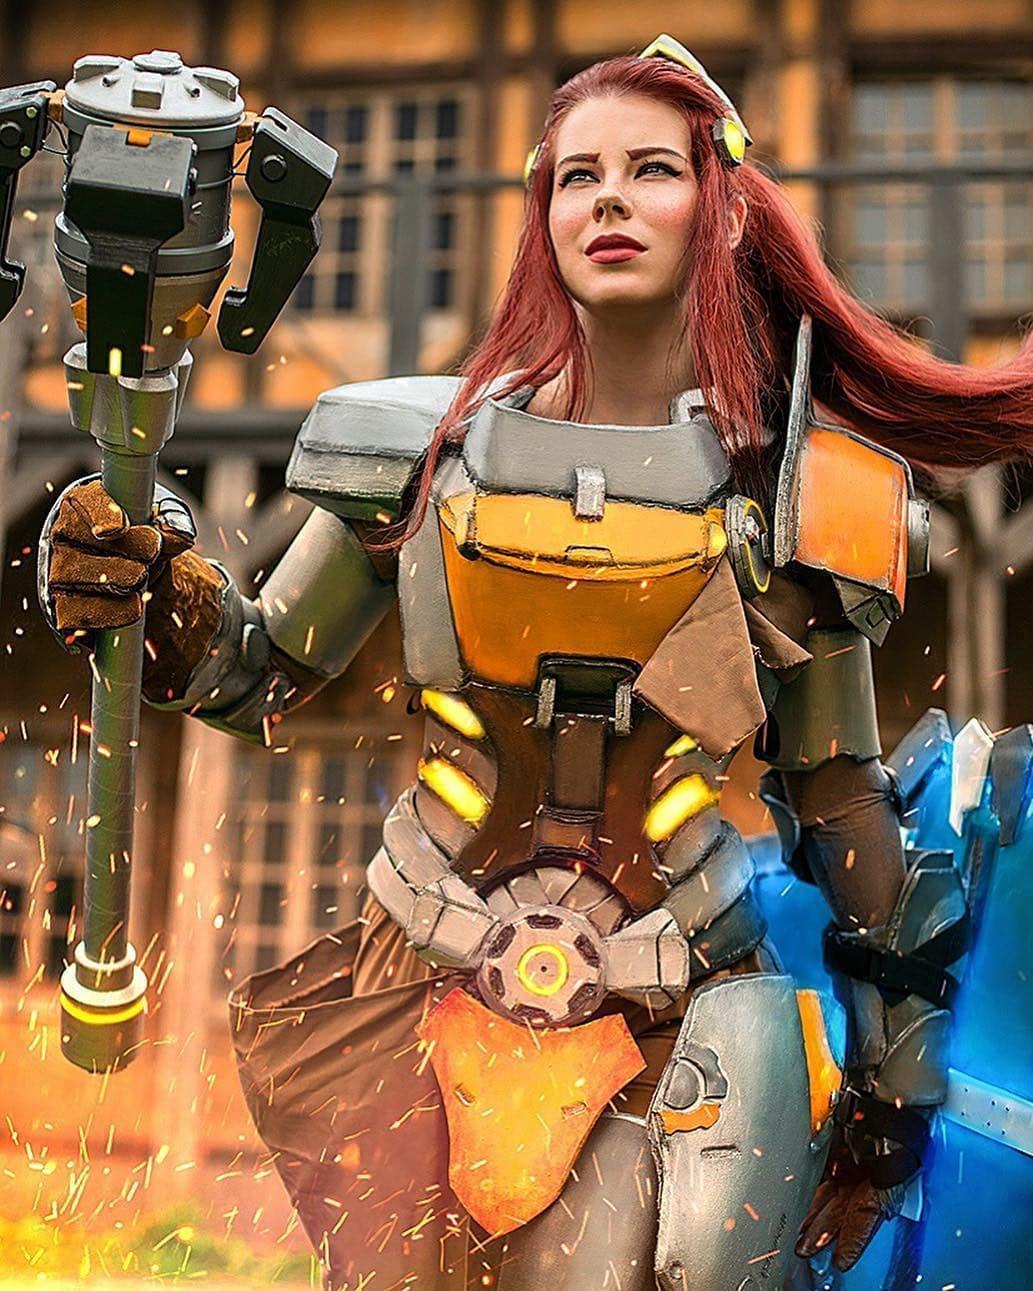 brigitte overwatch cosplay by anastasyazelenova Ph oltaura Edit alicenevermind